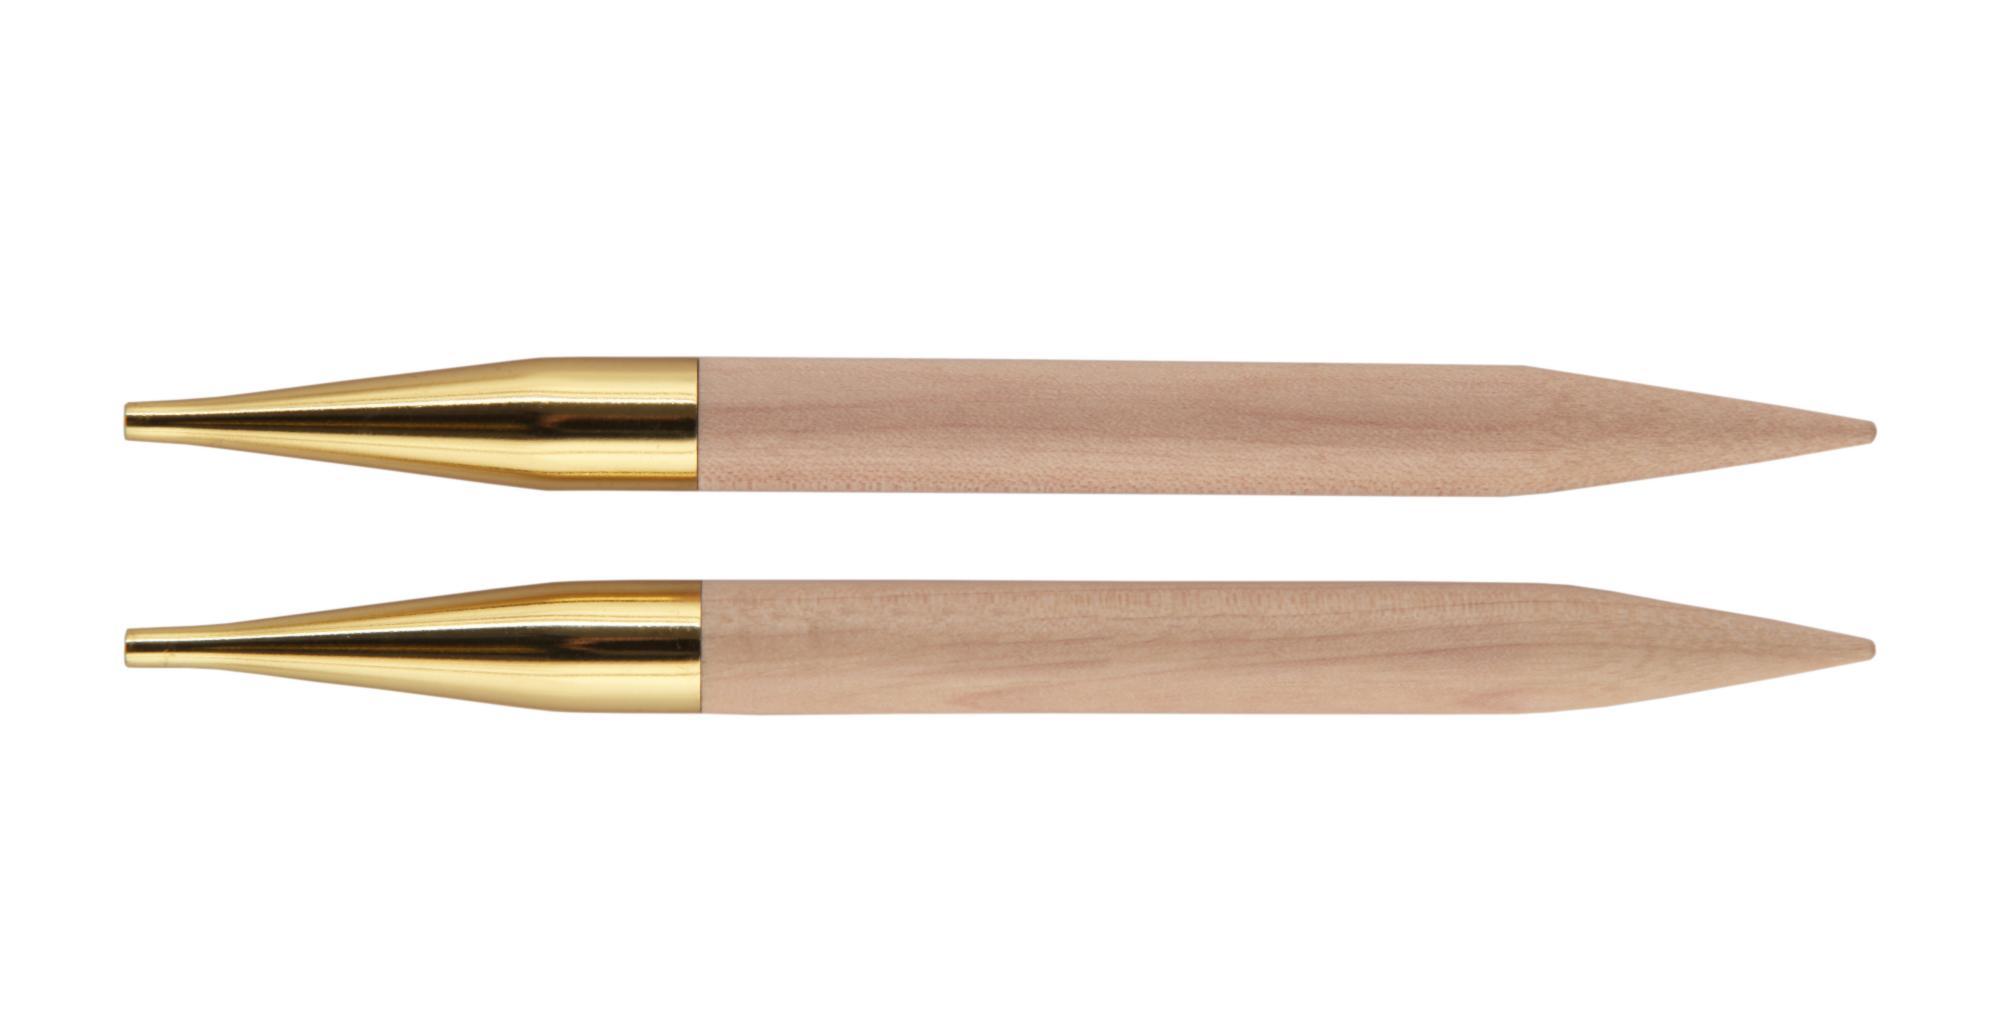 Спицы съемные Basix Birch Wood KnitPro, 35643, 9.00 мм